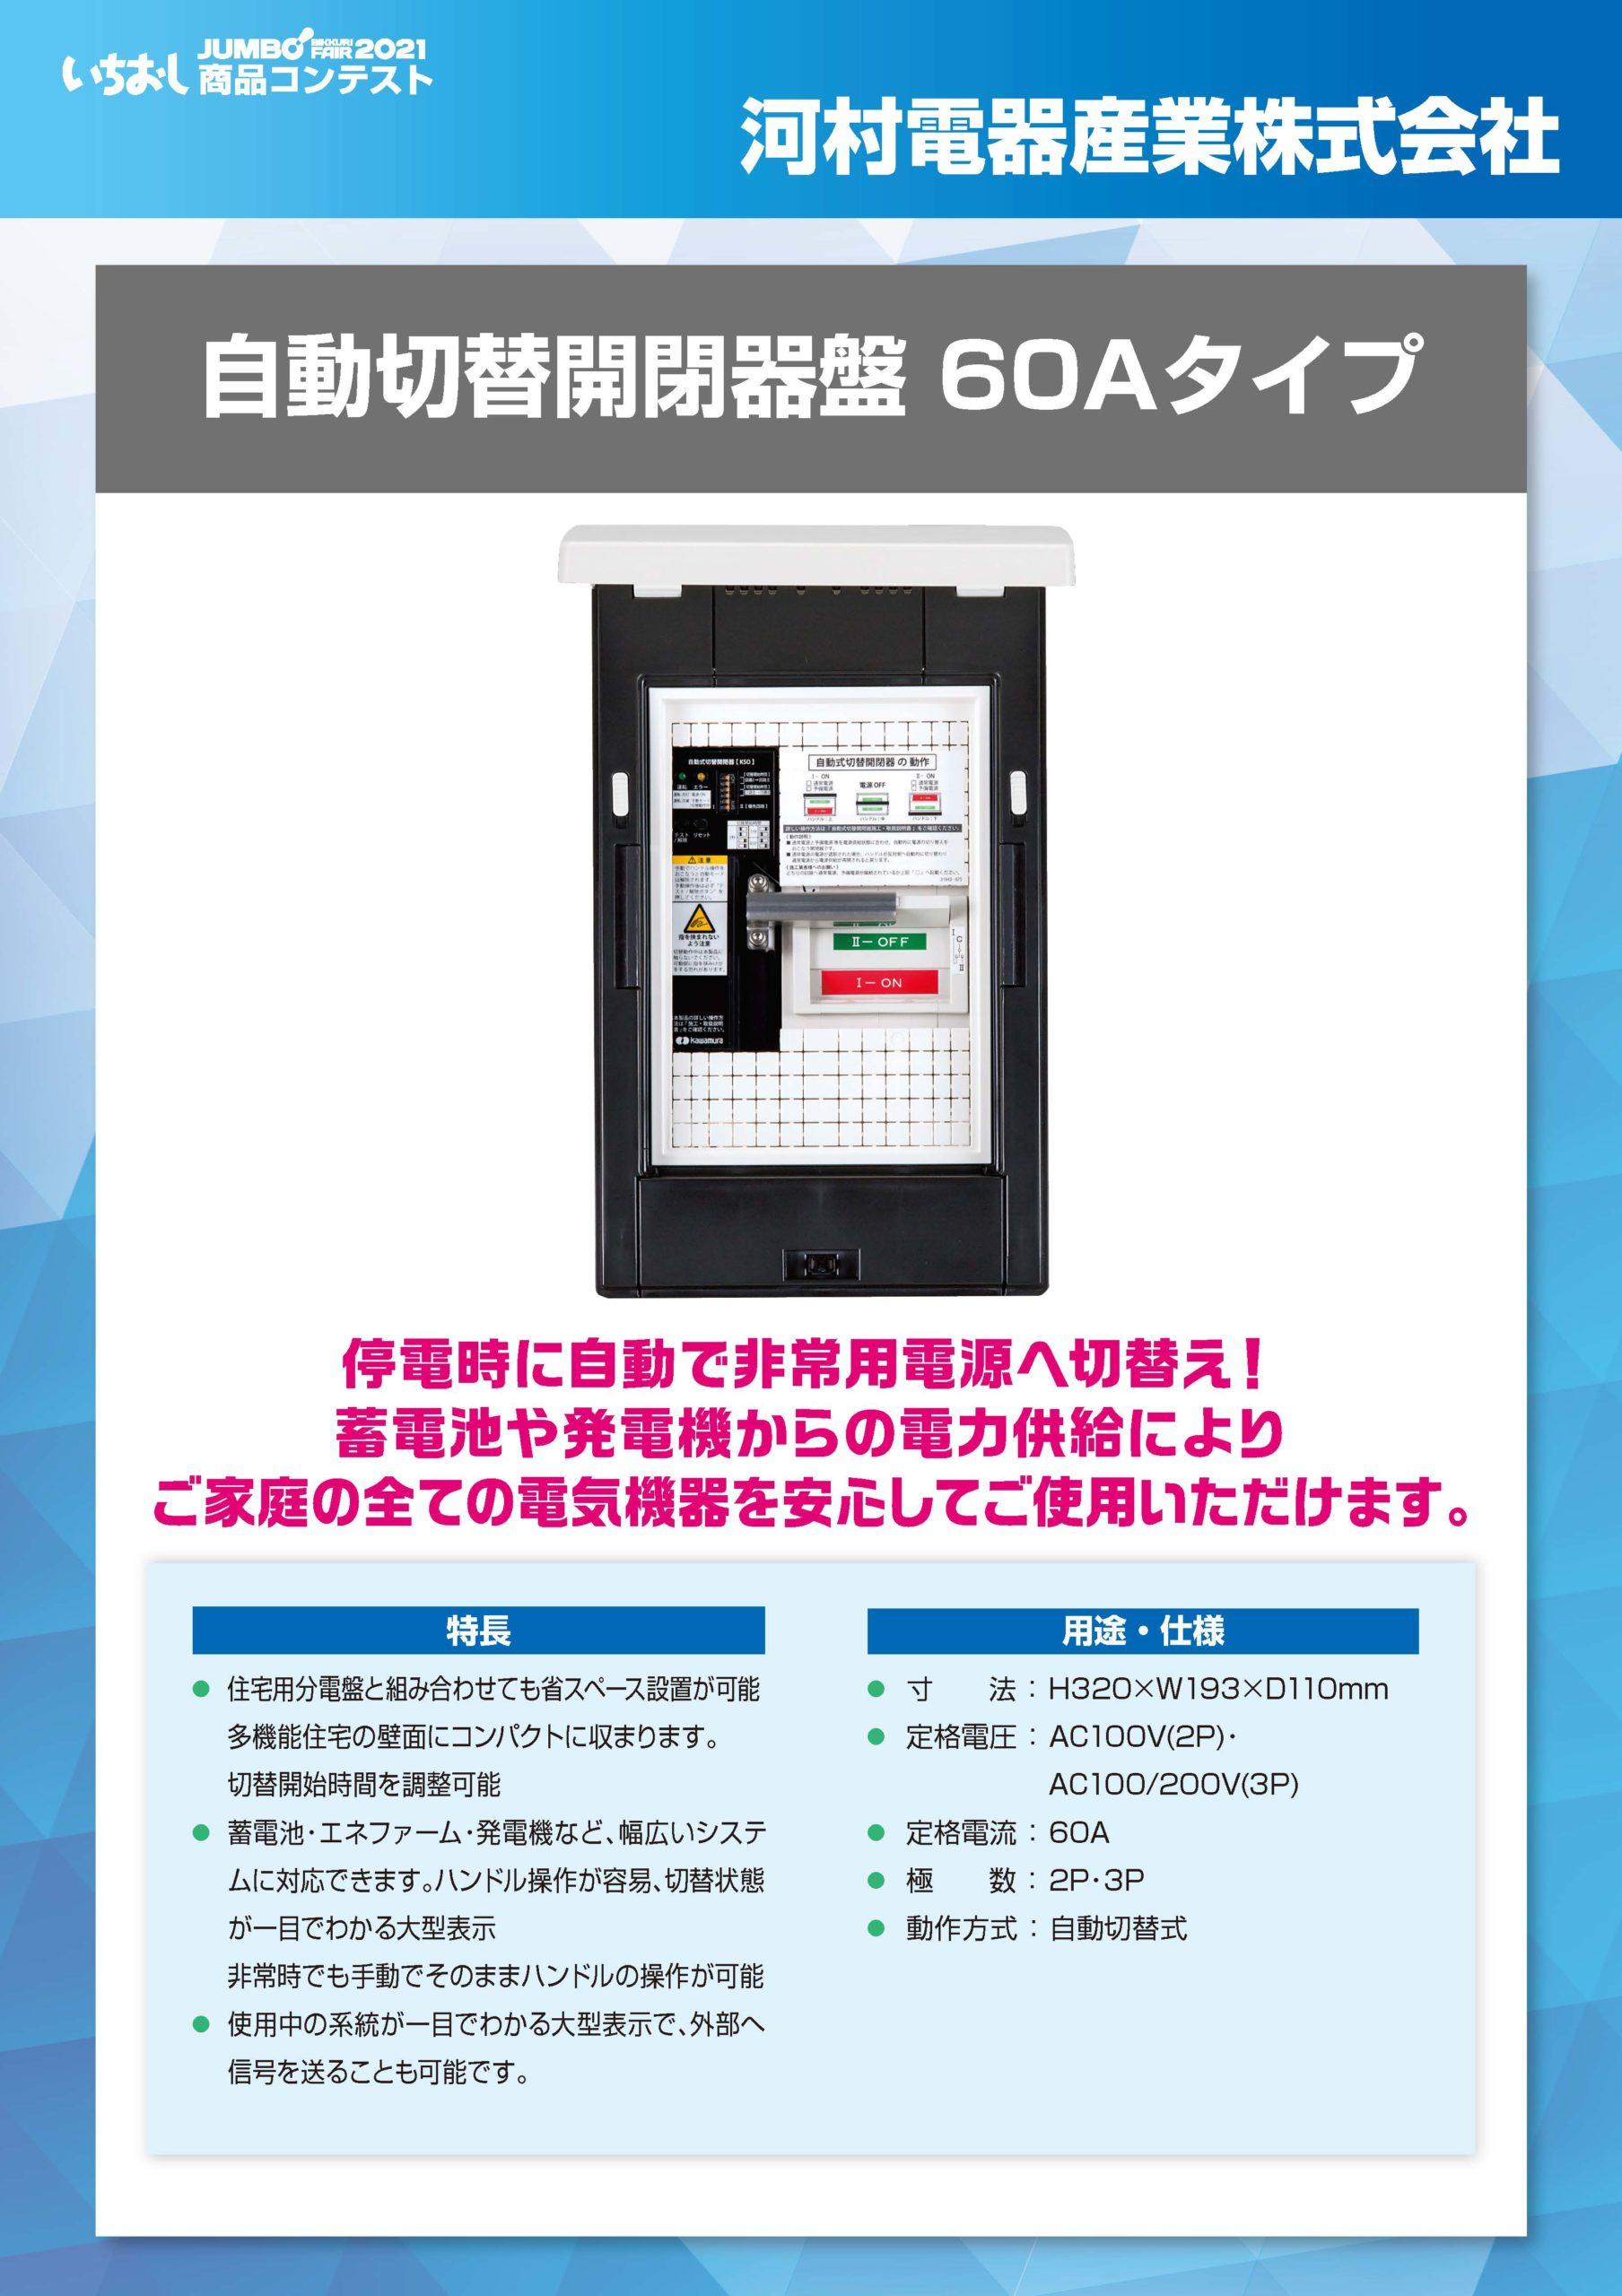 「自動切替開閉器盤 60Aタイプ」河村電器産業株式会社の画像